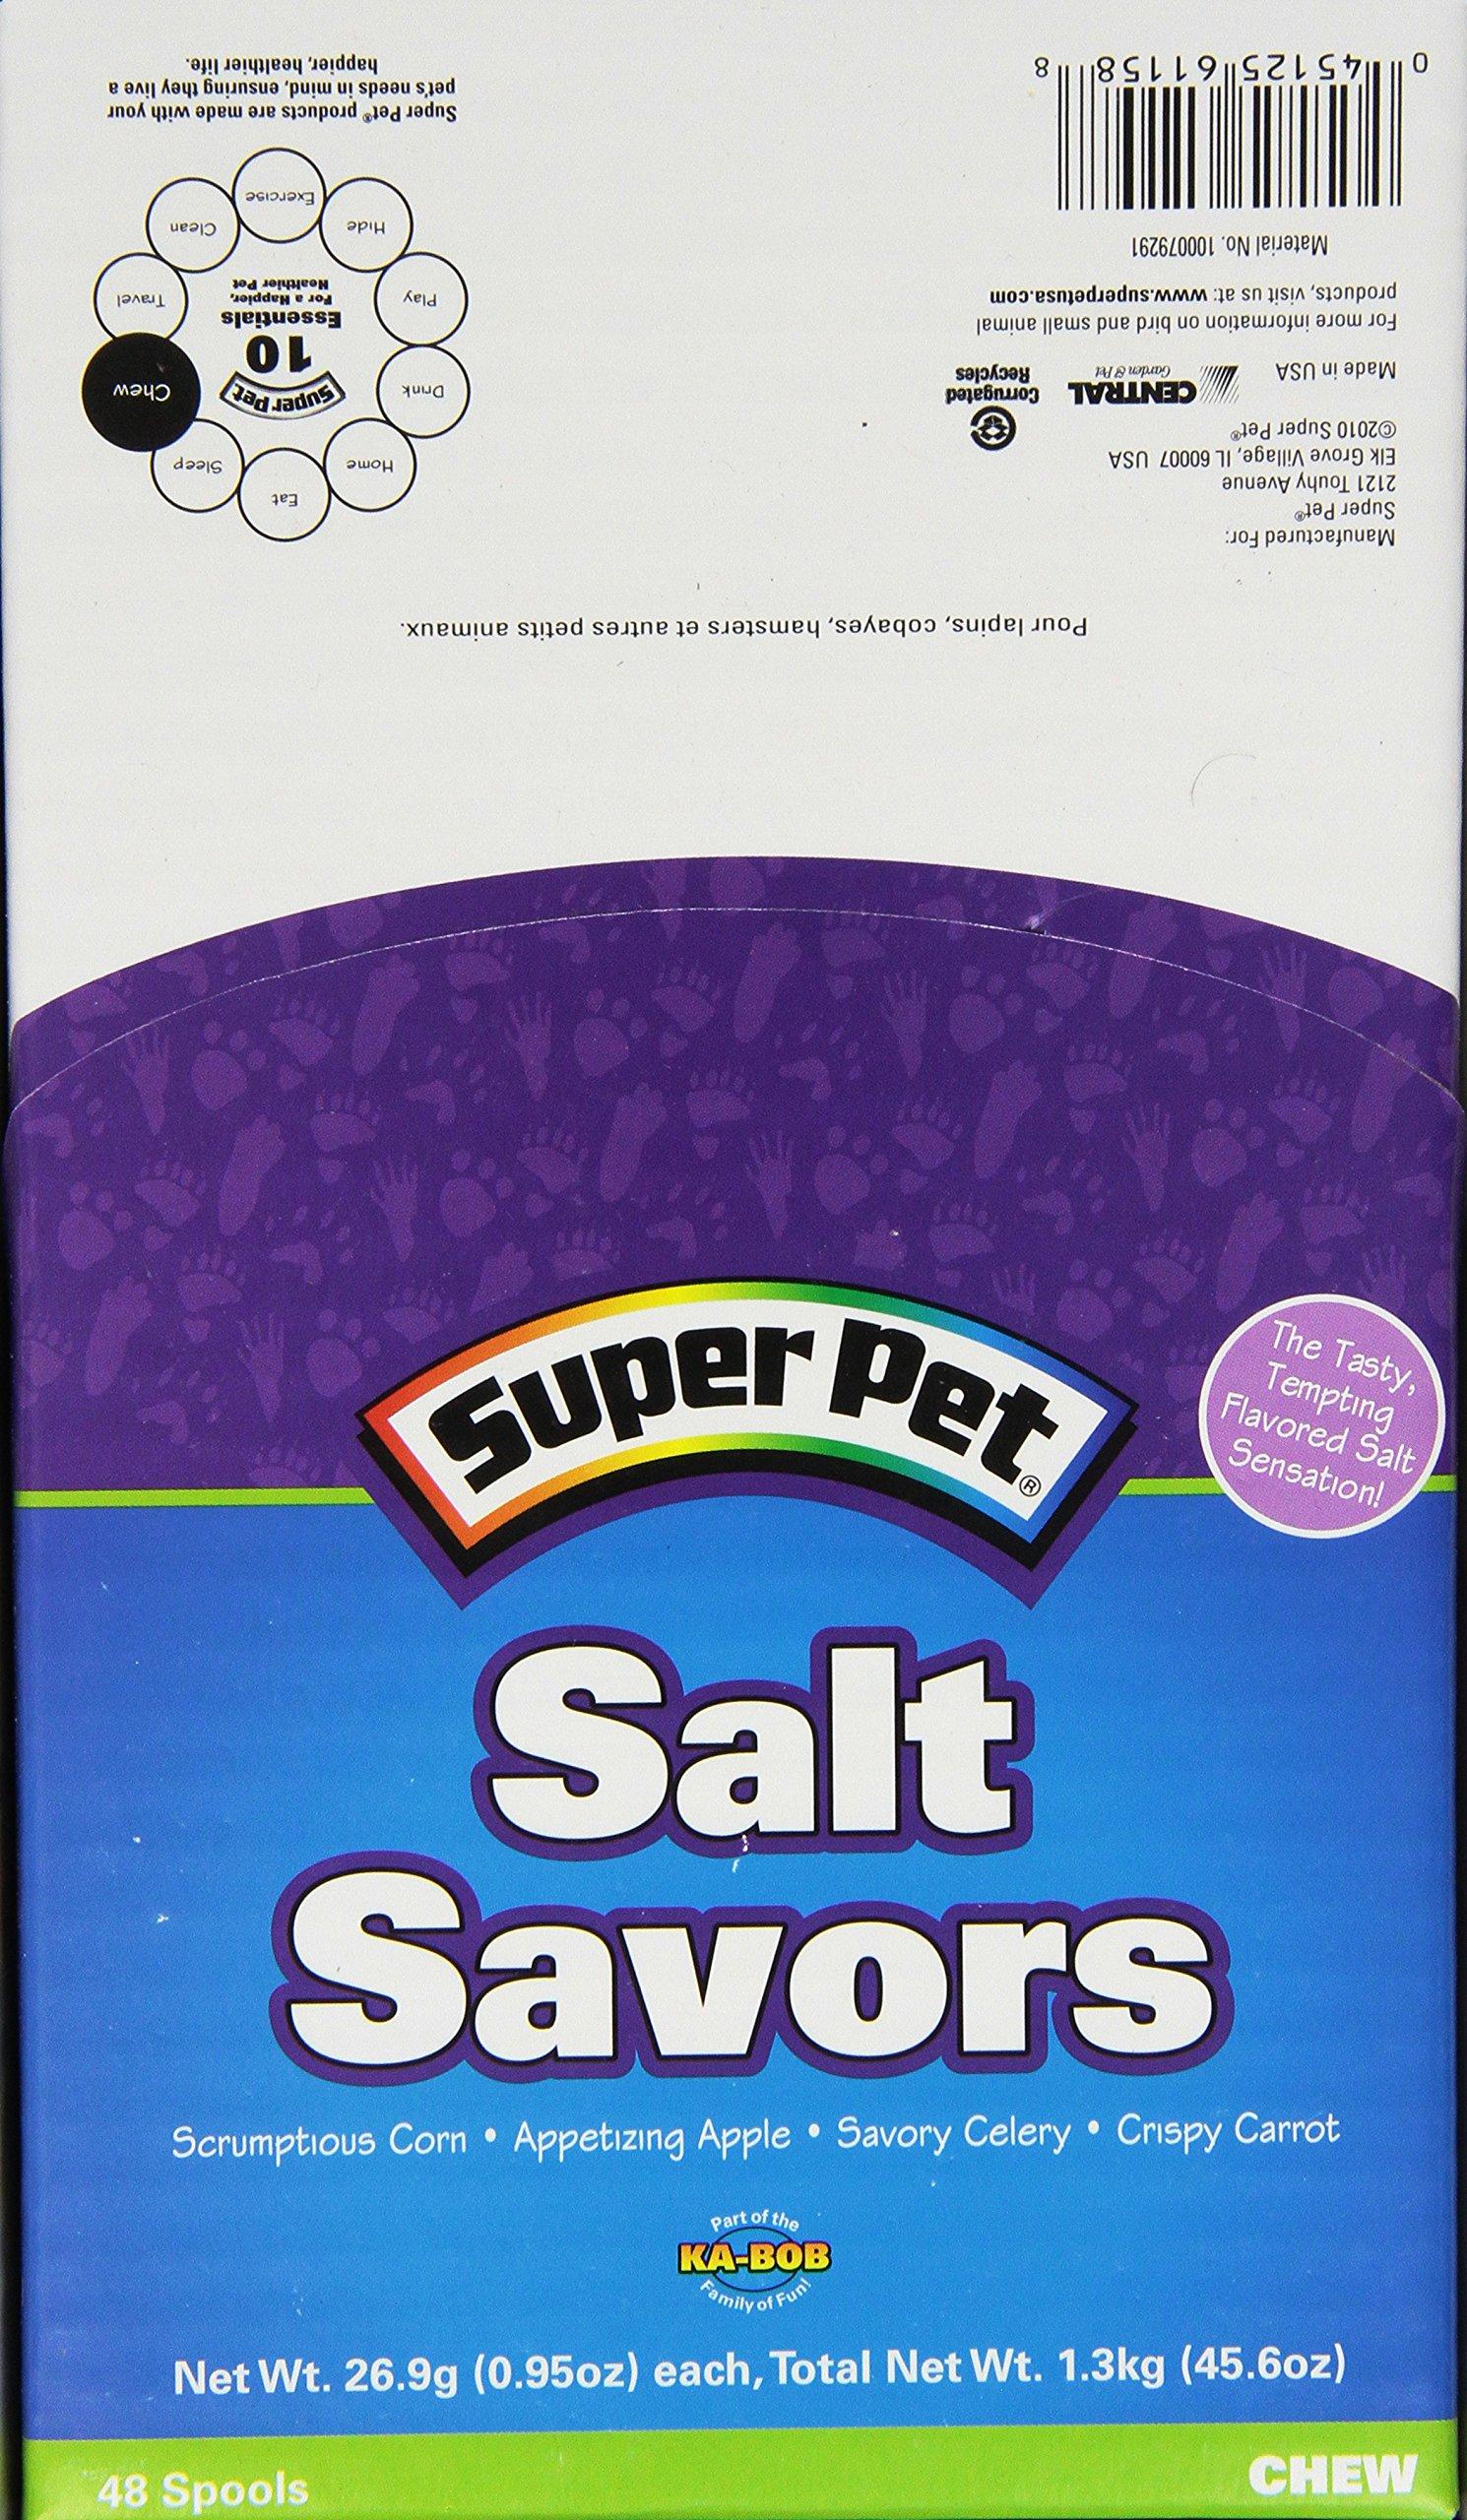 Superpet (Pets International) Ssr61158 48-Pack Small Animal Mini Salt Savors Pet Treat With Counter Display